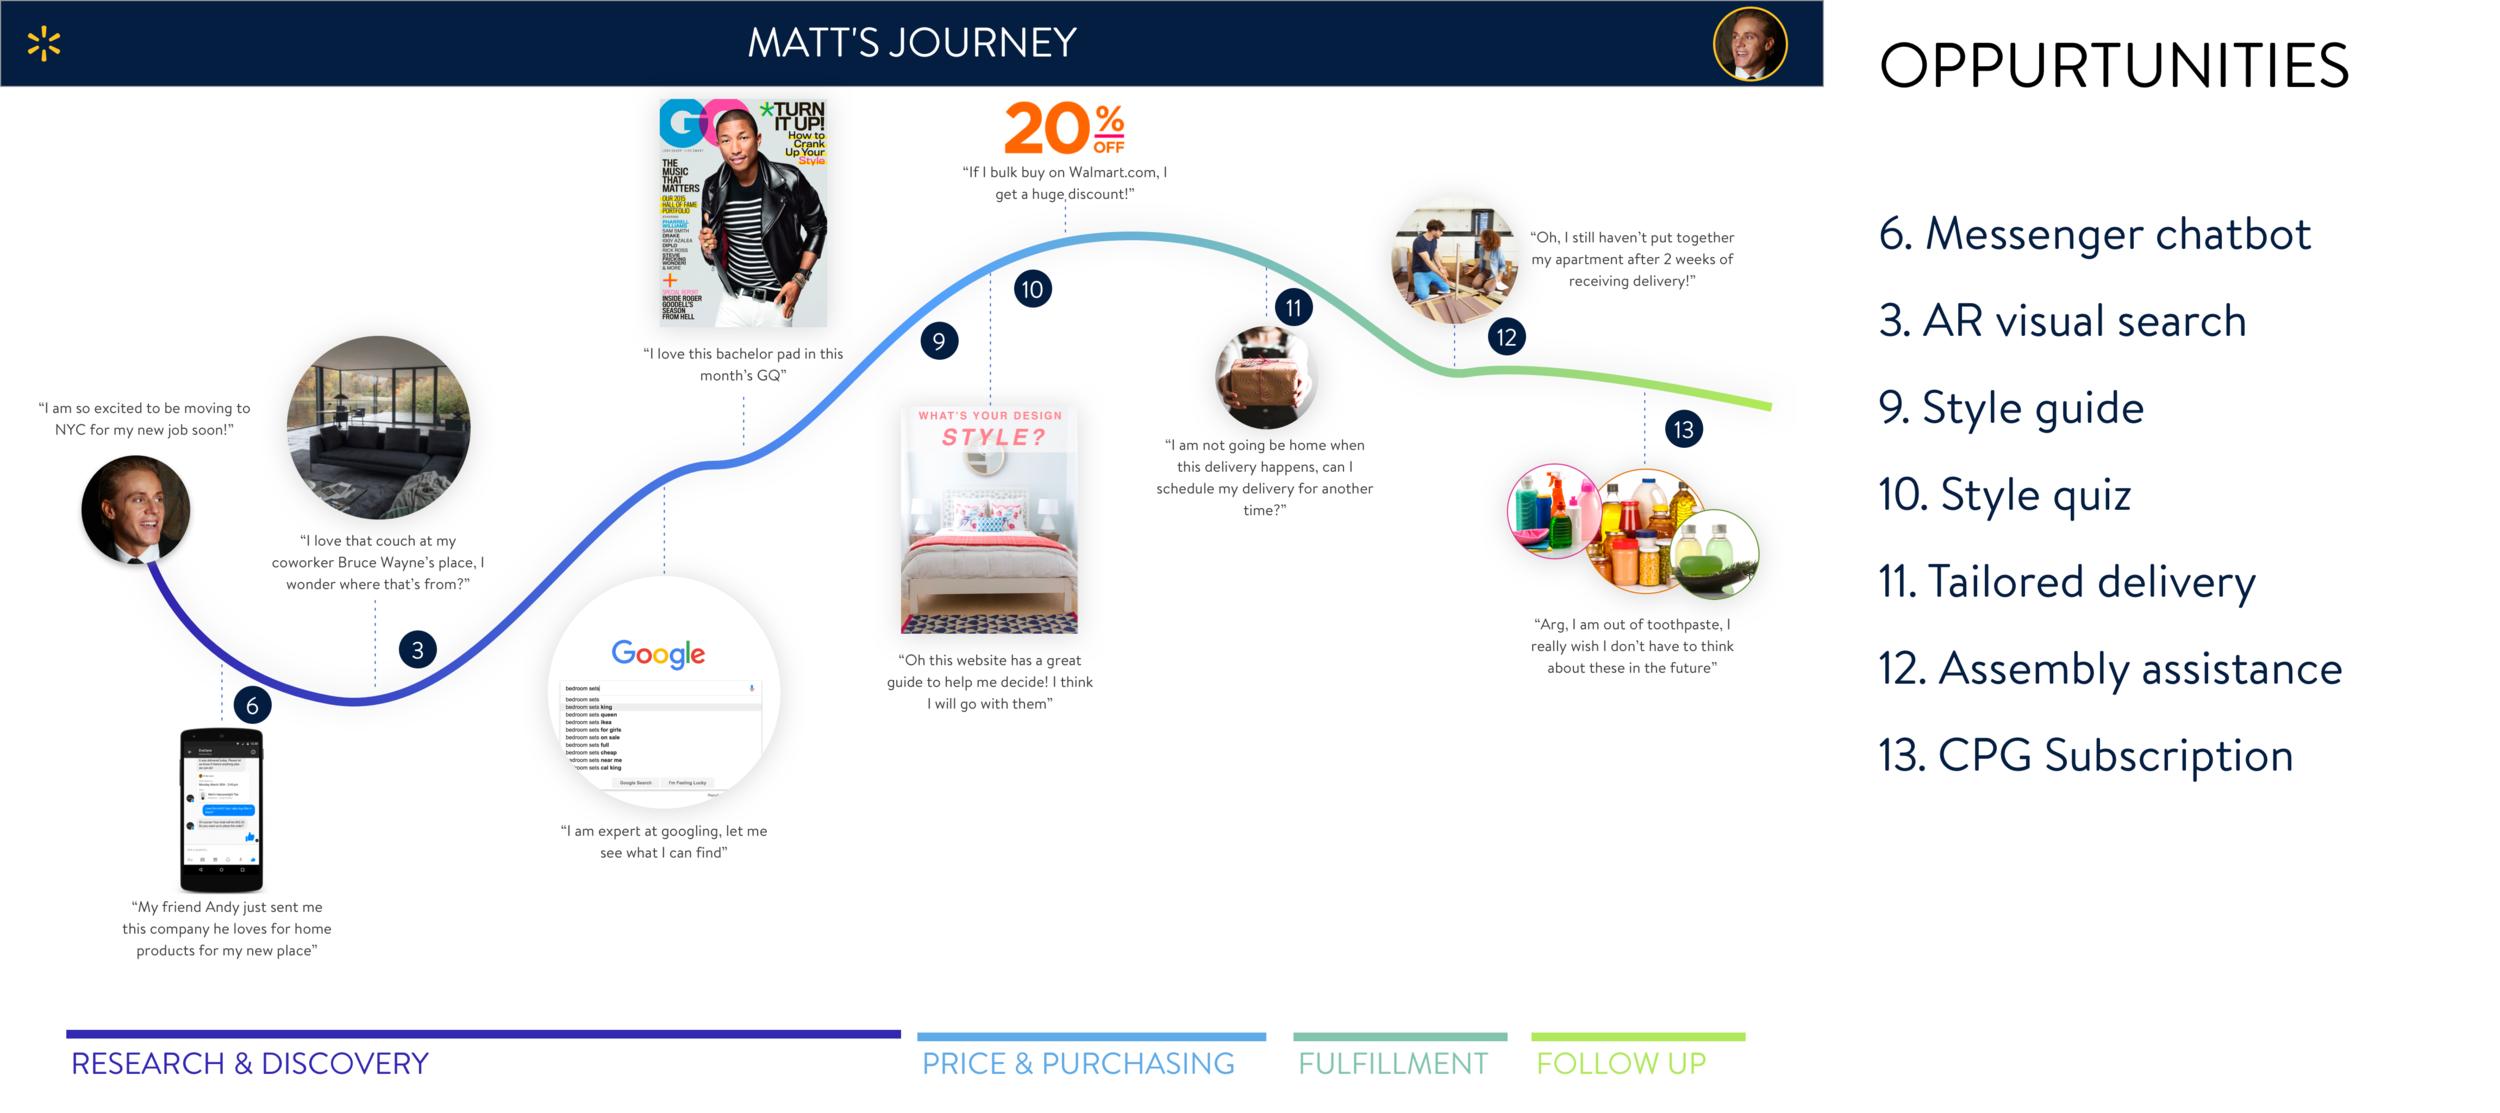 matt's journey@2x.png